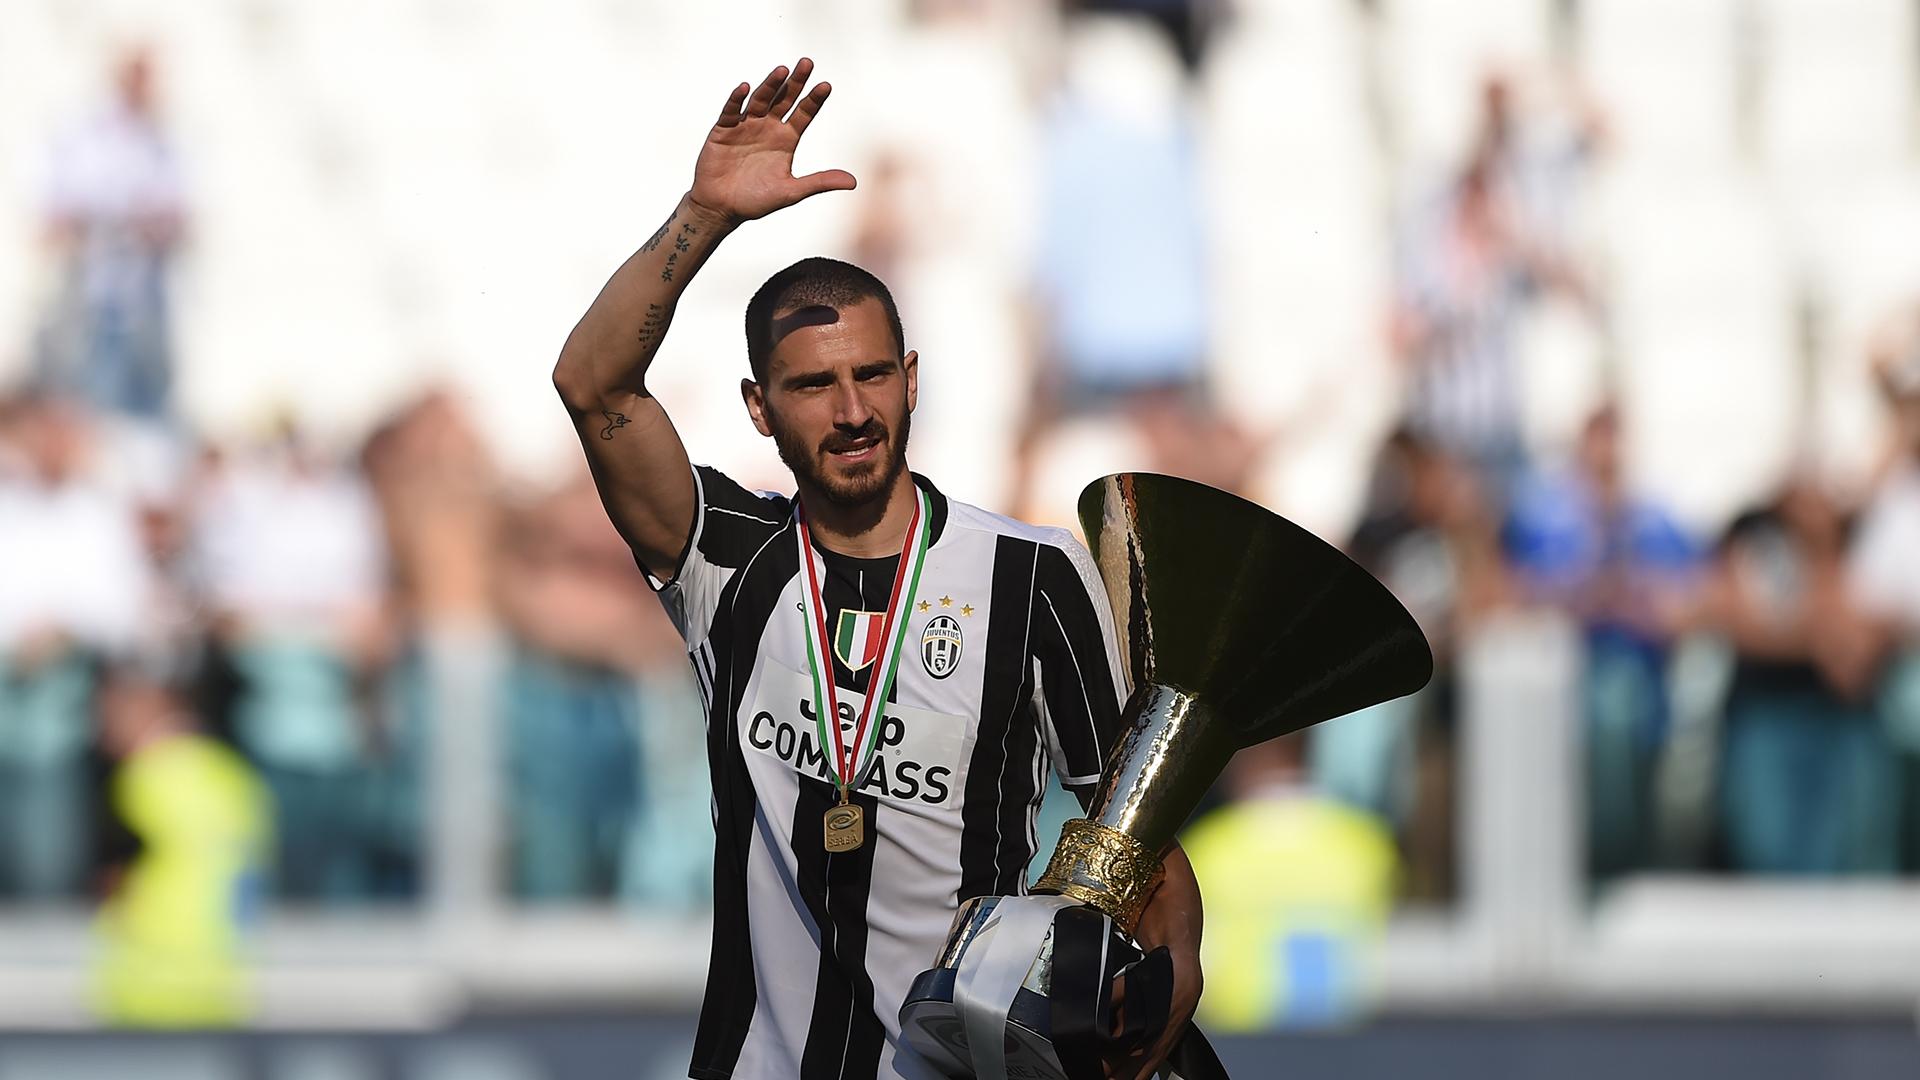 El Milán ya negocia por Bonucci: primera oferta de 30M